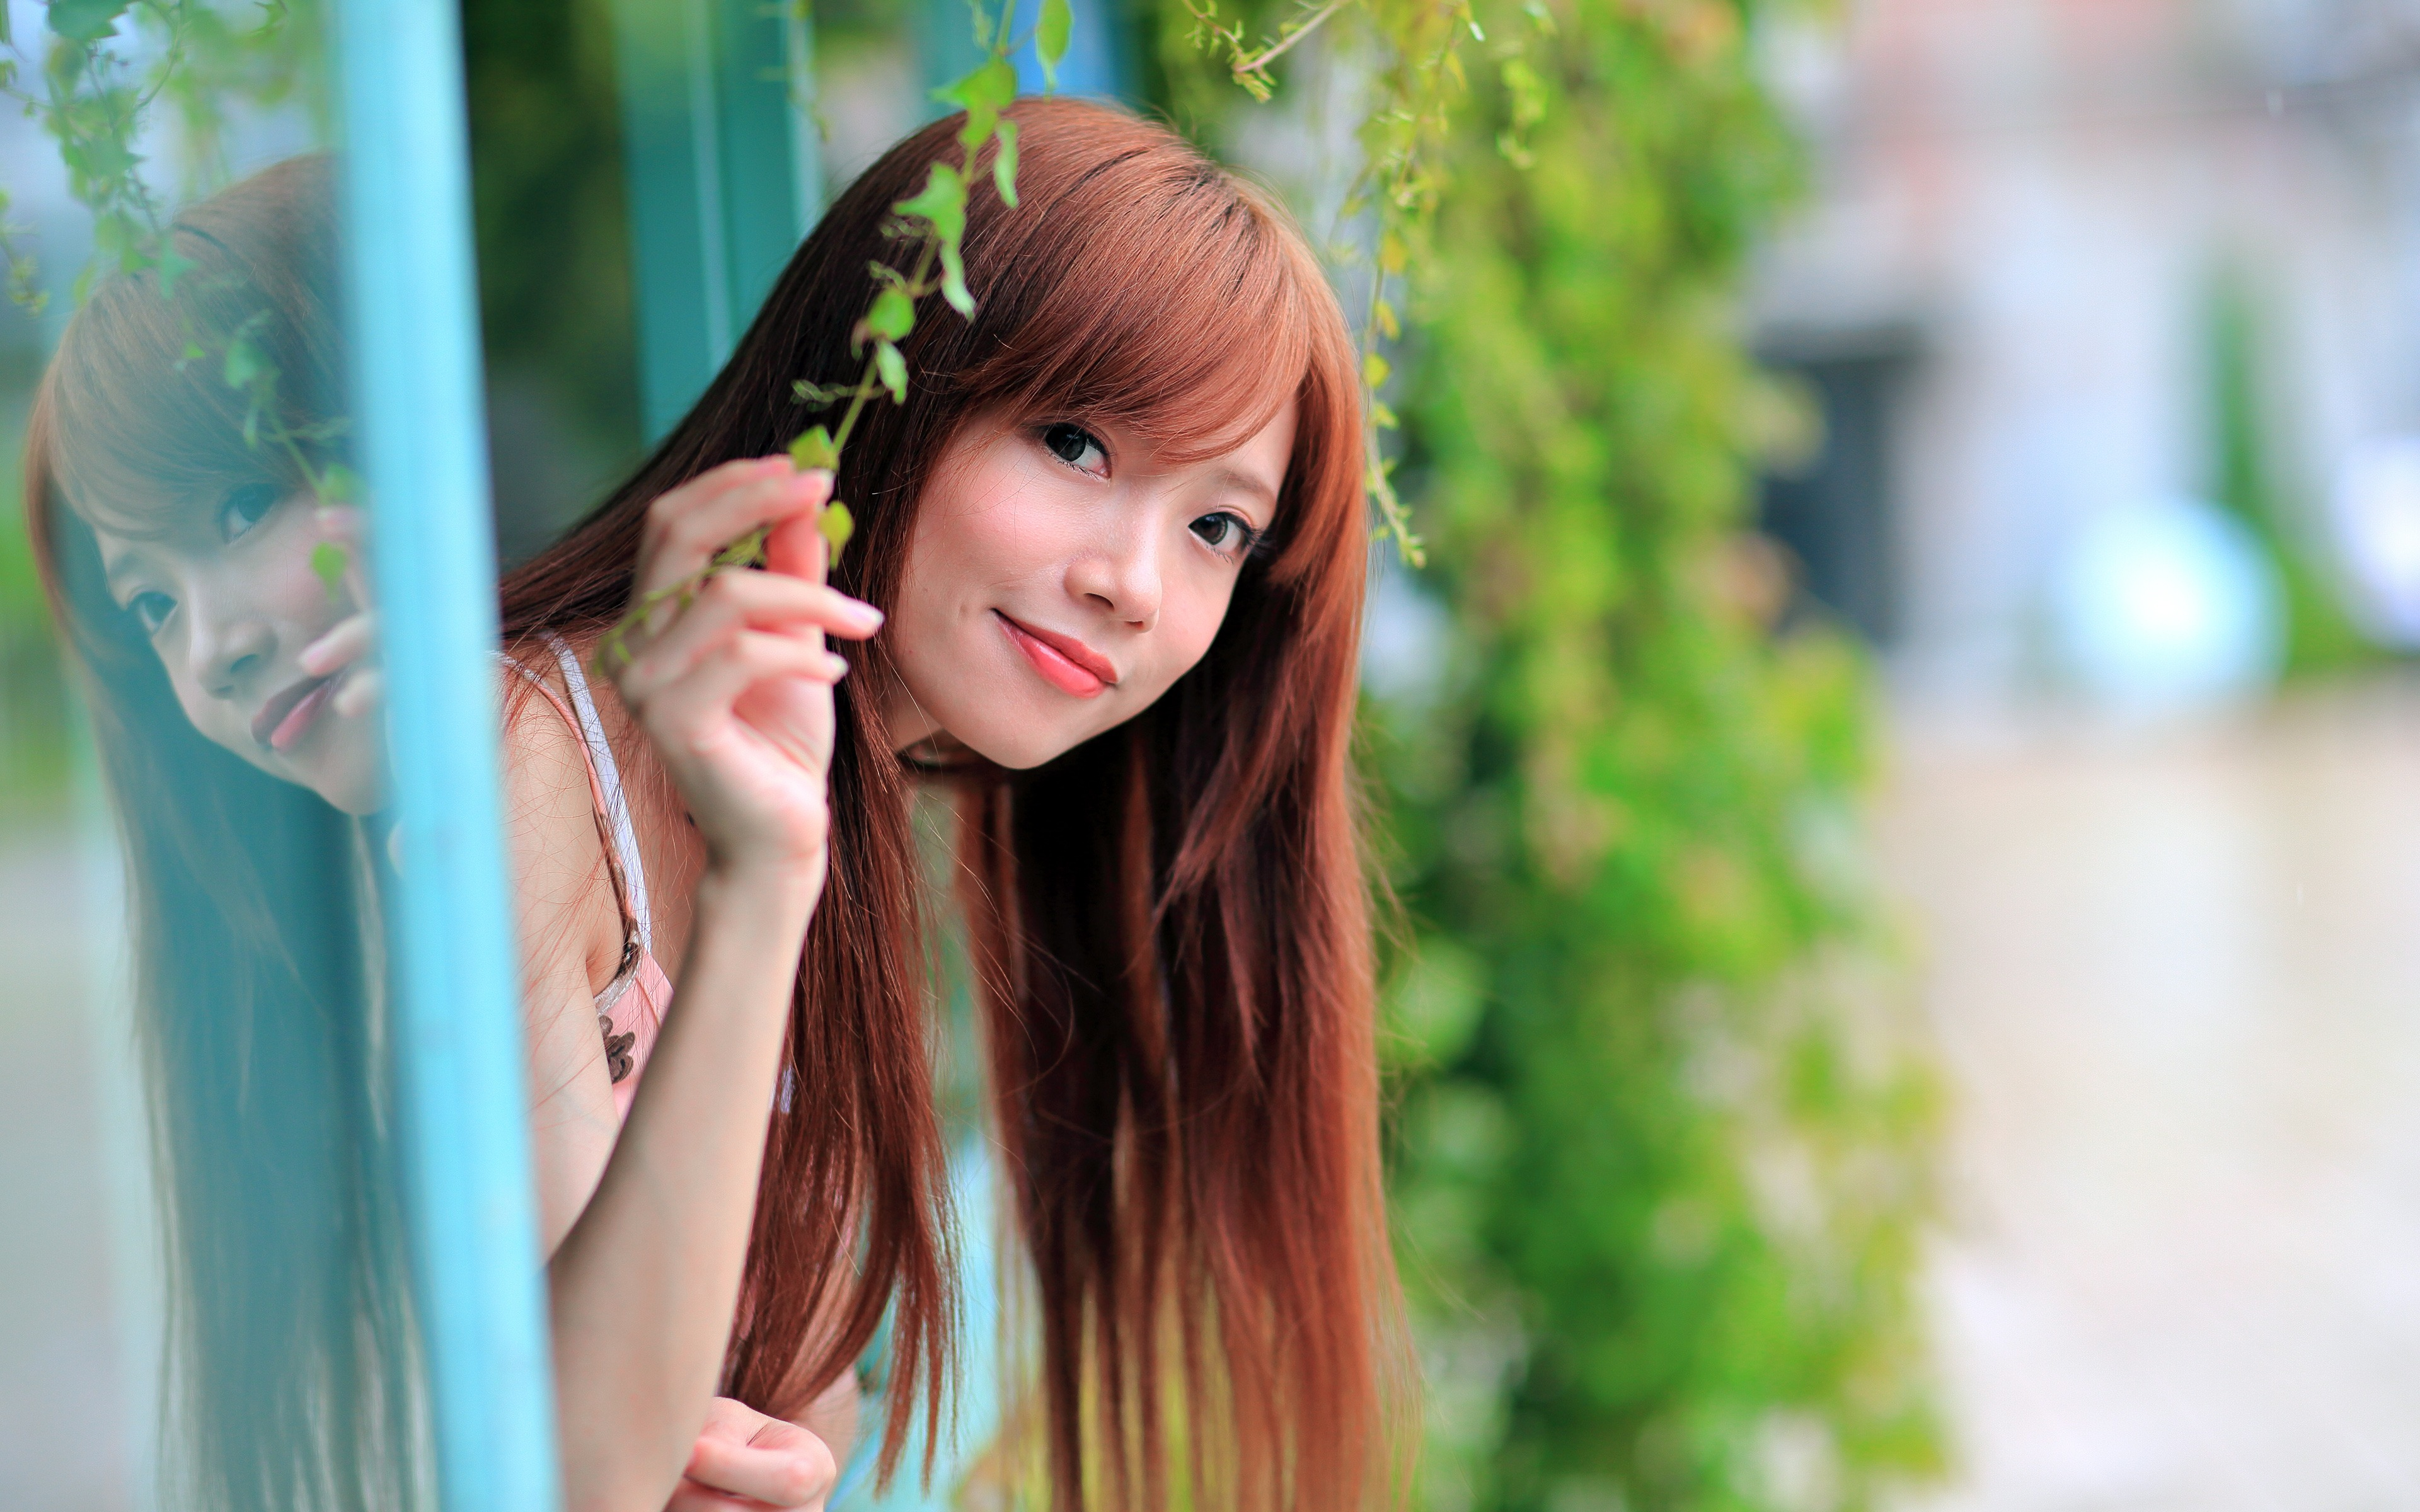 Korea 2018 Cute Beautiful Girl Photo Preview | 10wallpaper.com